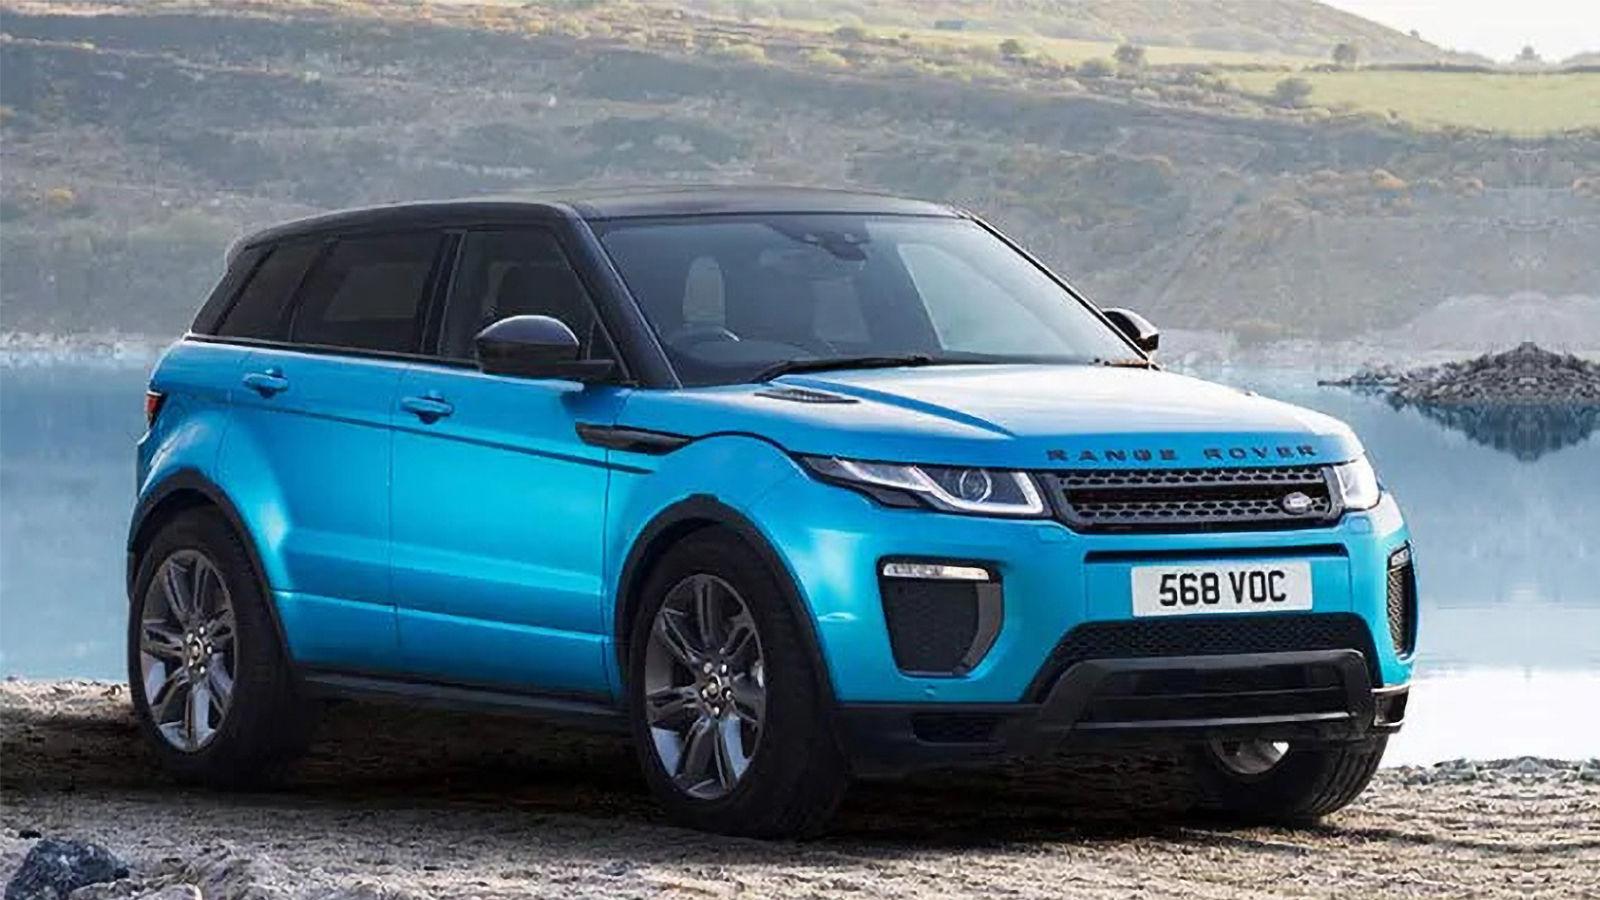 Range Rover Evoque Landmark Edition